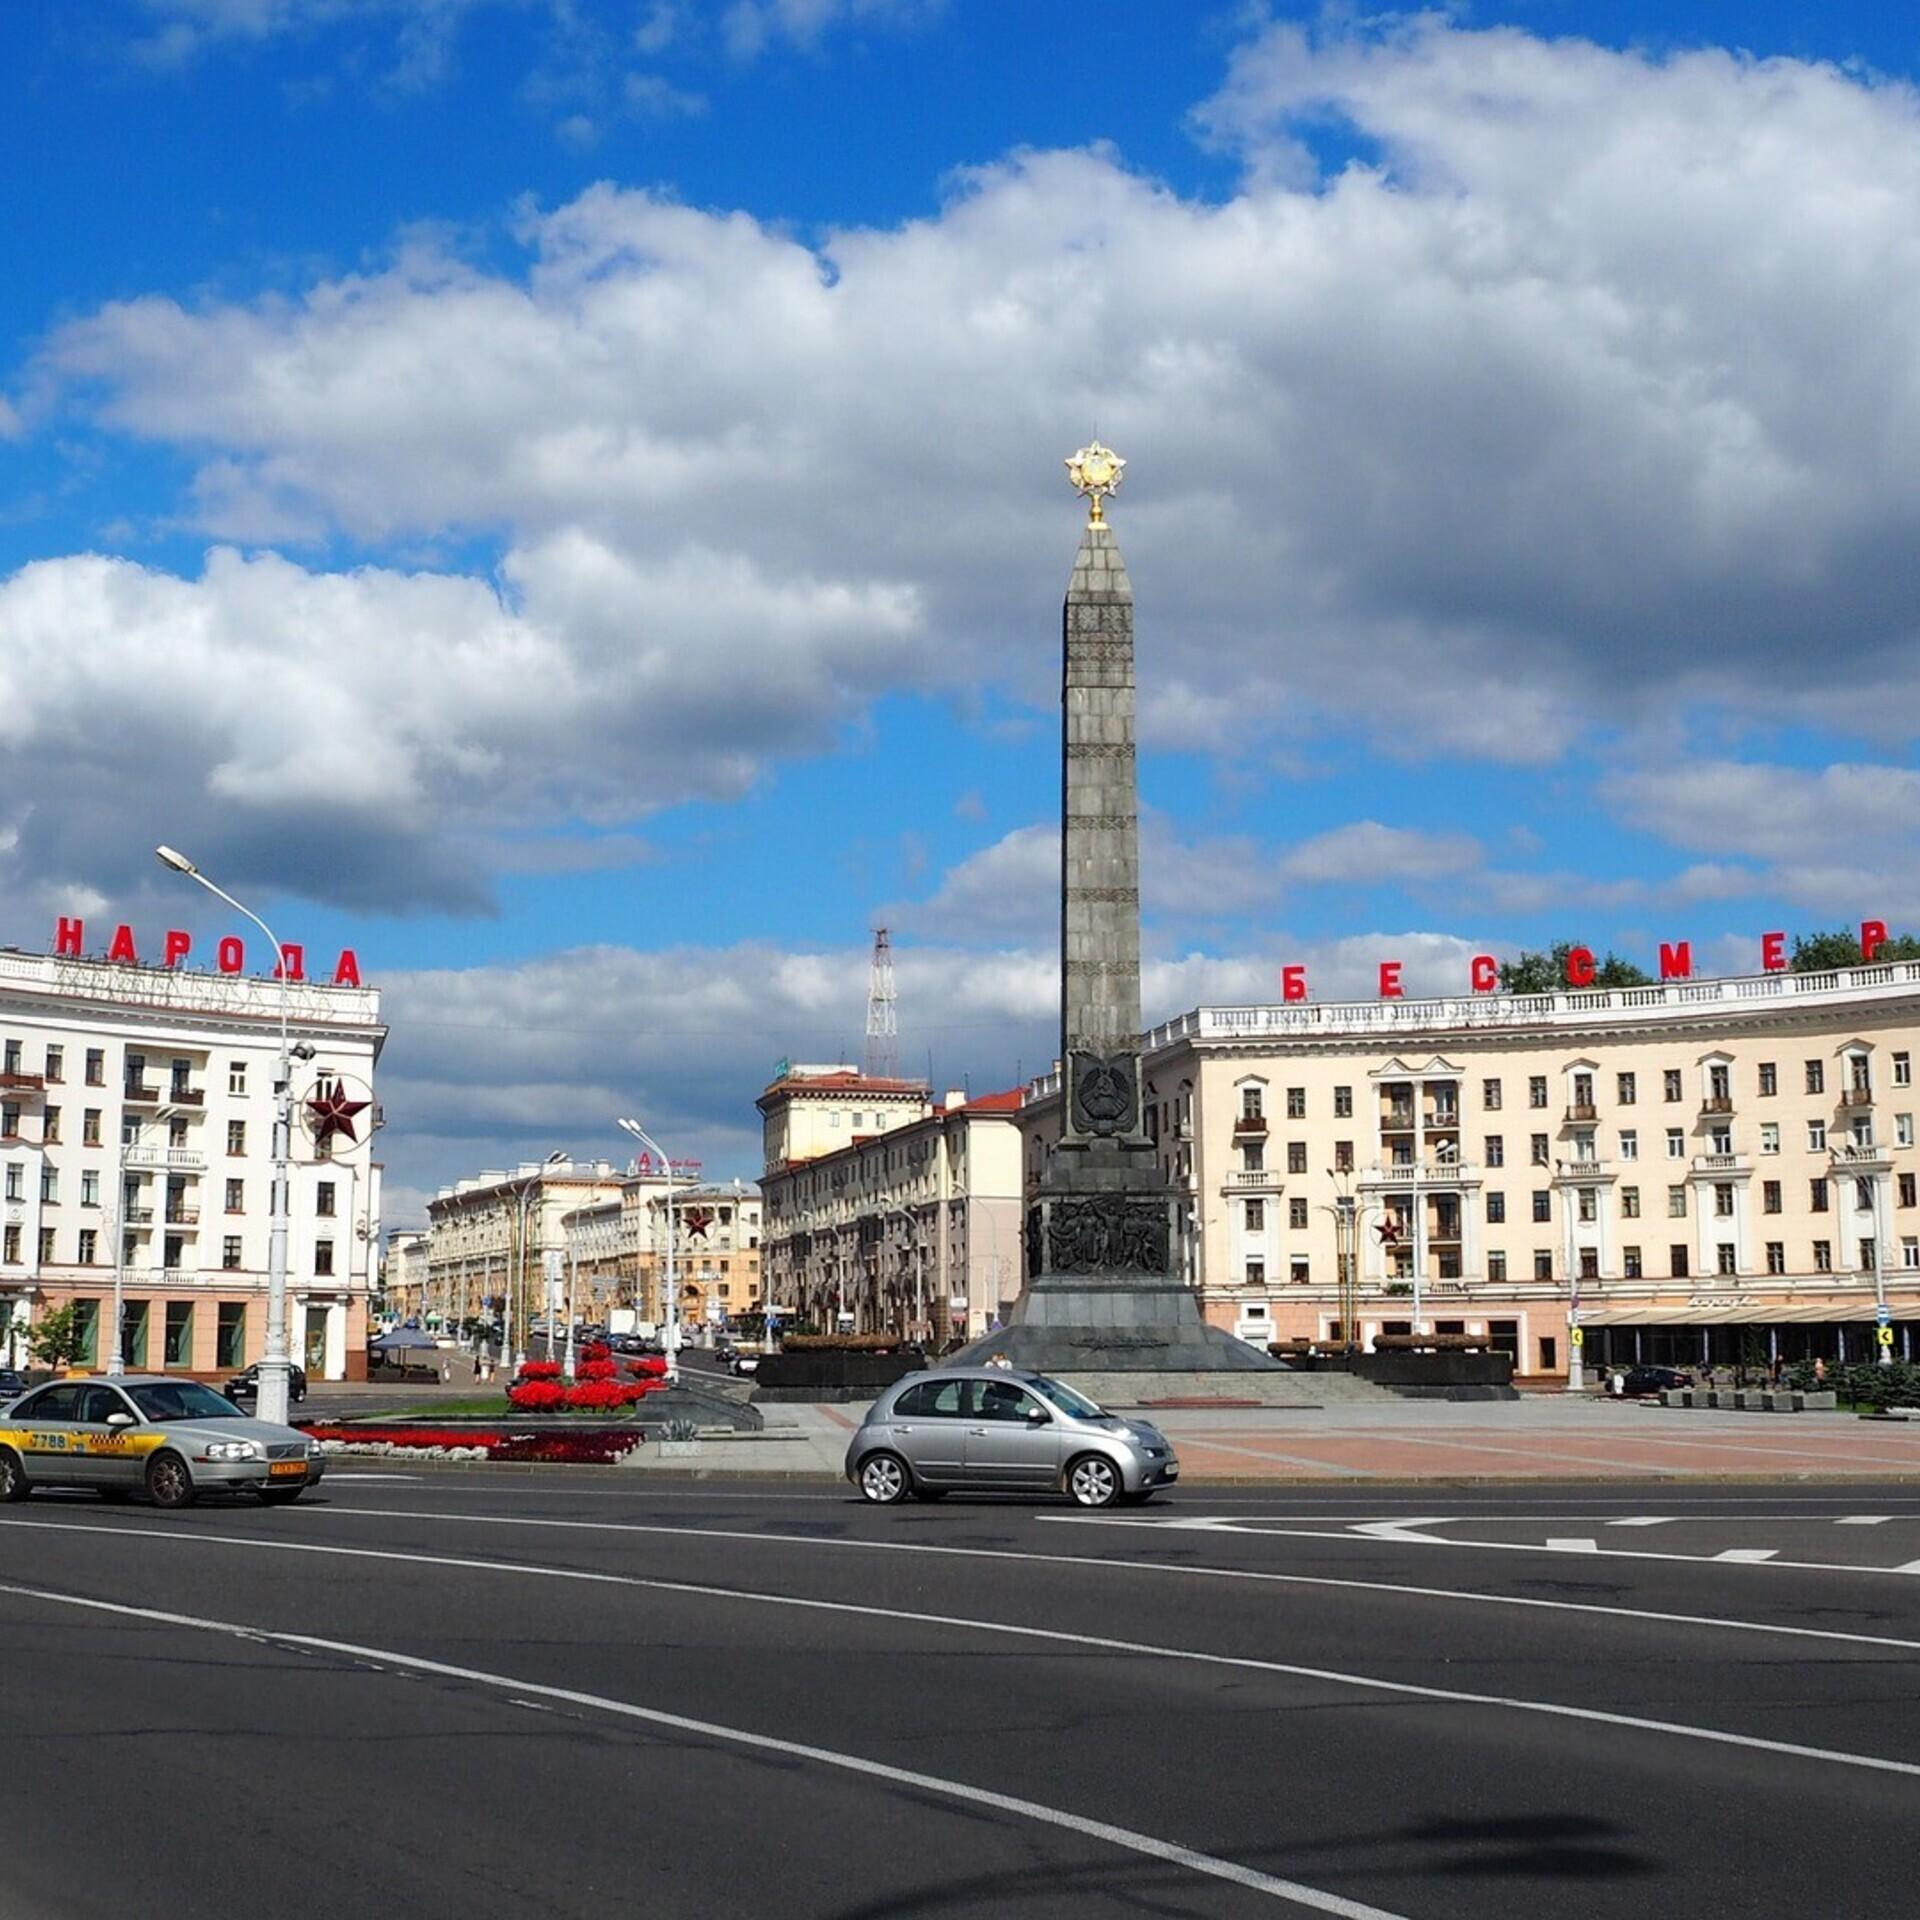 Беларусь по-прежнему готова предоставлять площадку для ТКГ по ситуации на Донбассе